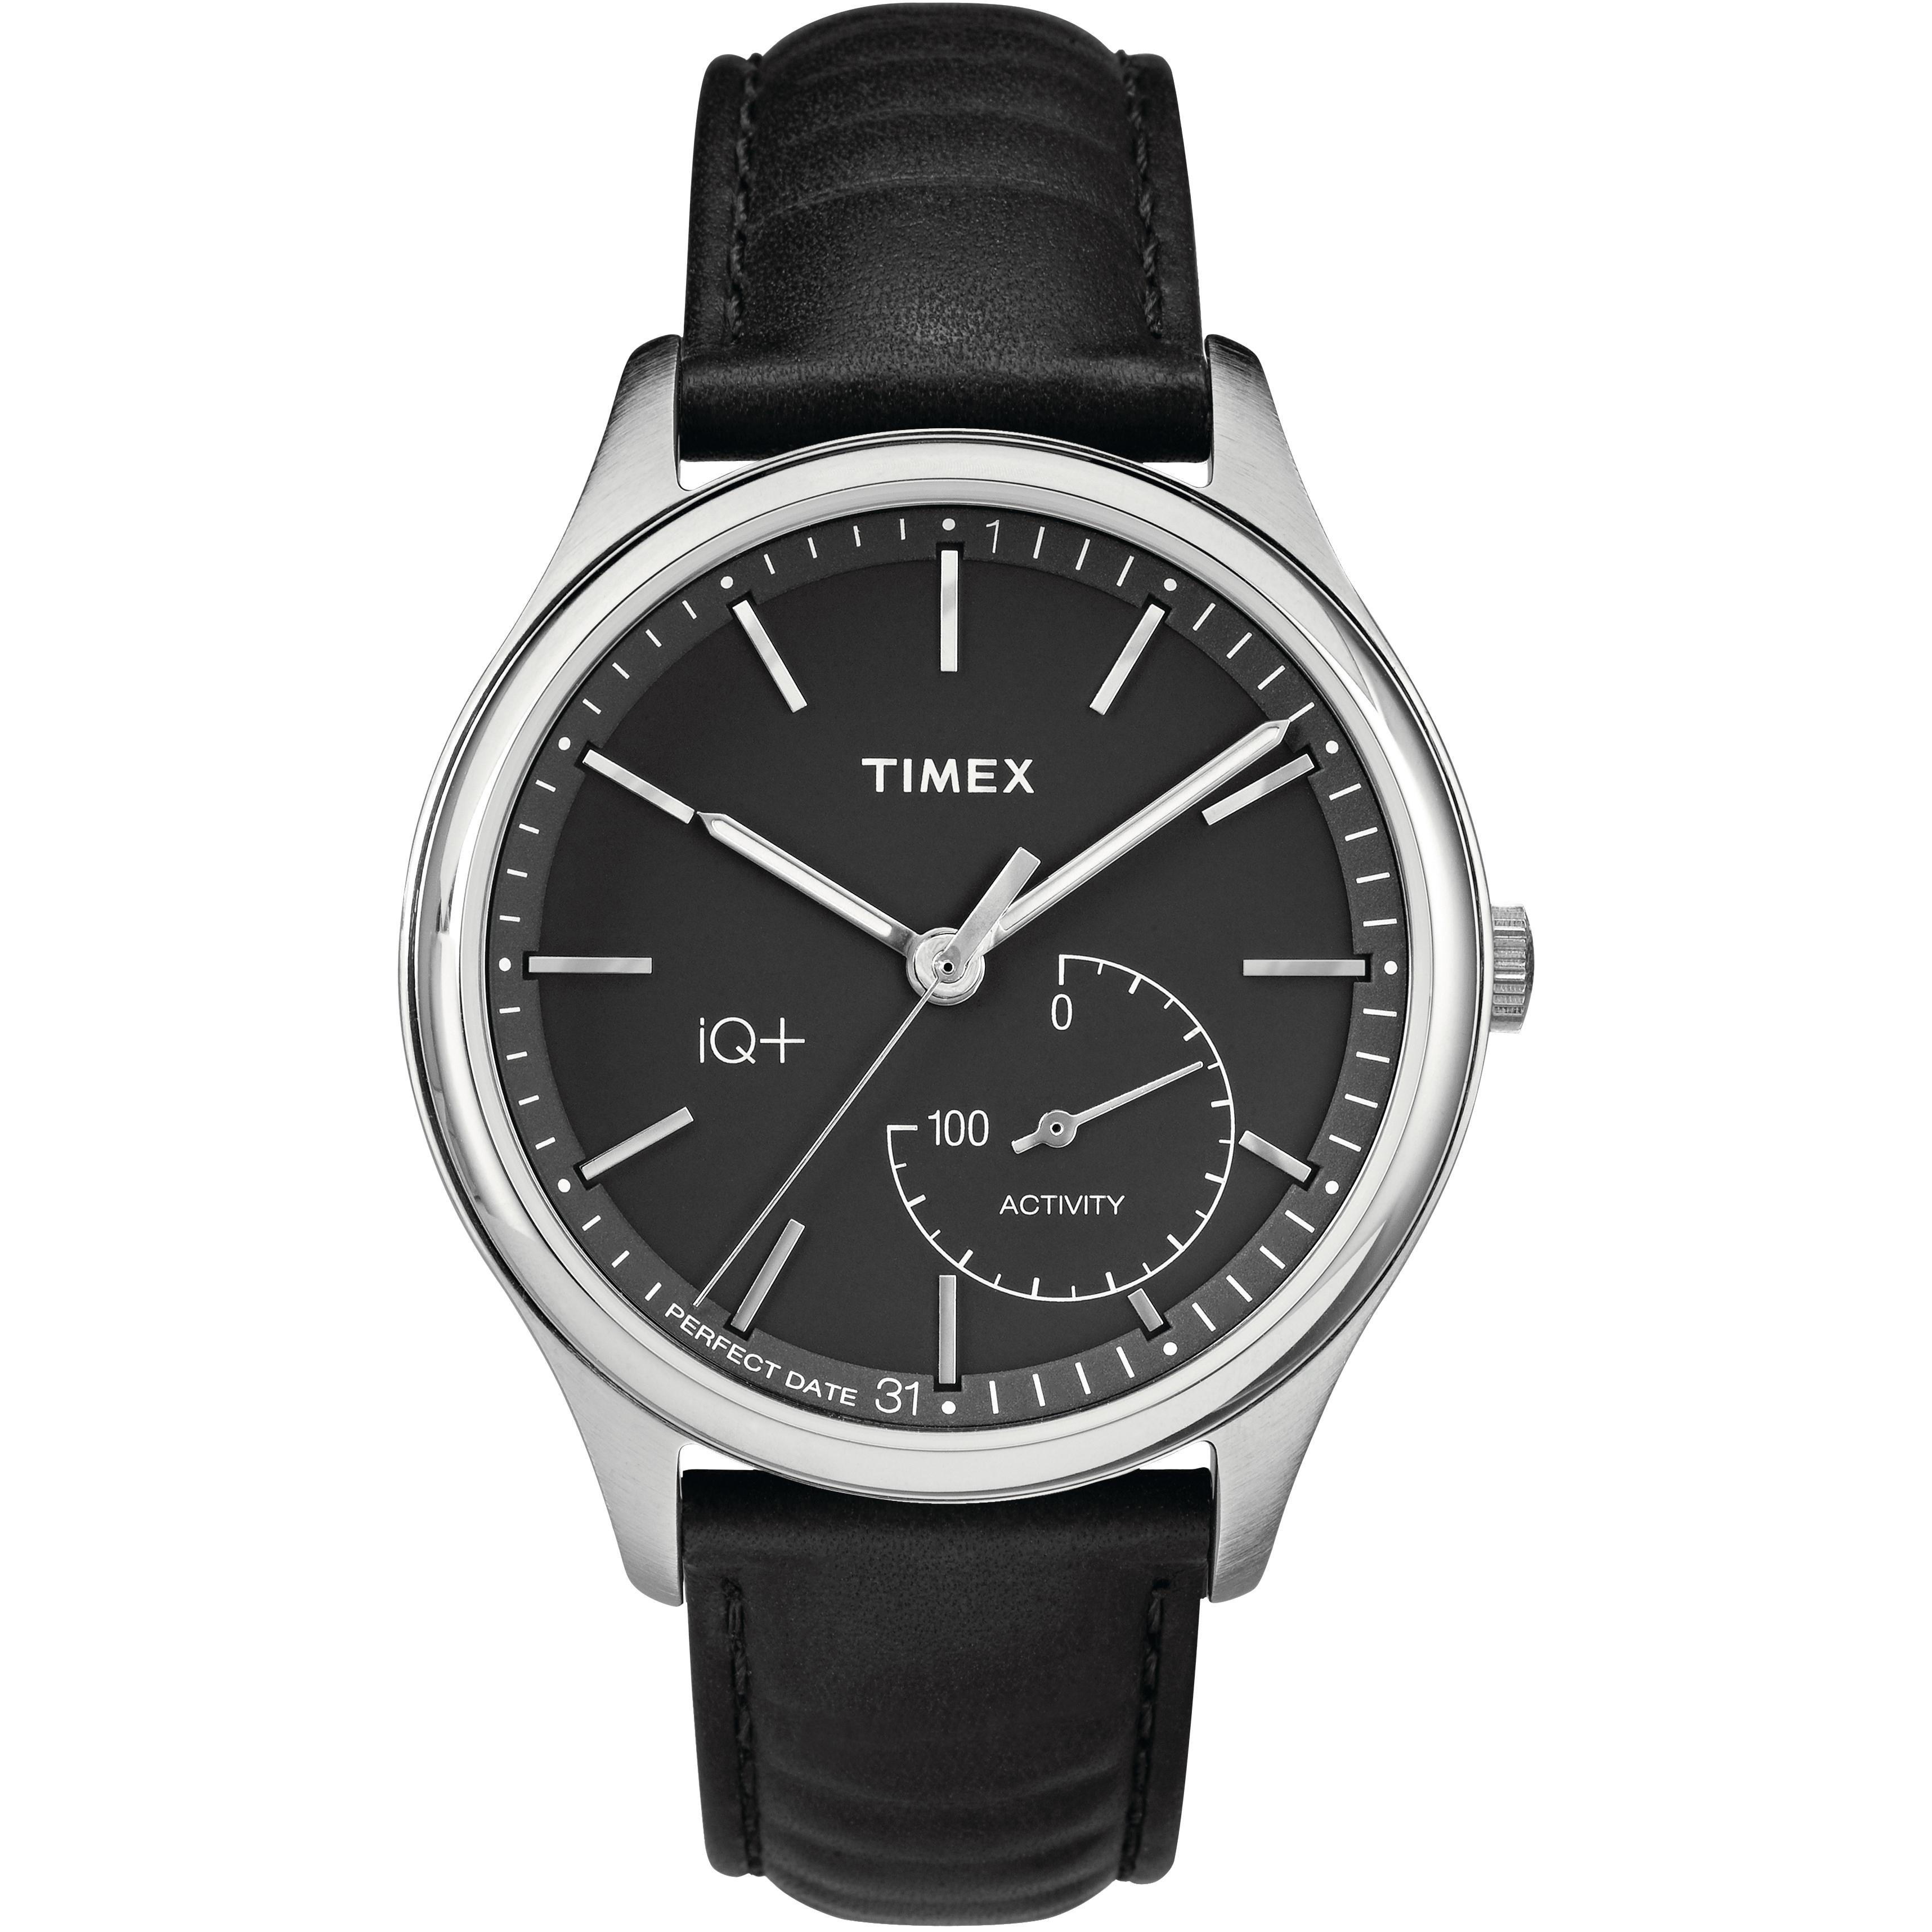 hommes timex iq move activity tracker bluetooth hybride smartwatch montre tw2p93200. Black Bedroom Furniture Sets. Home Design Ideas